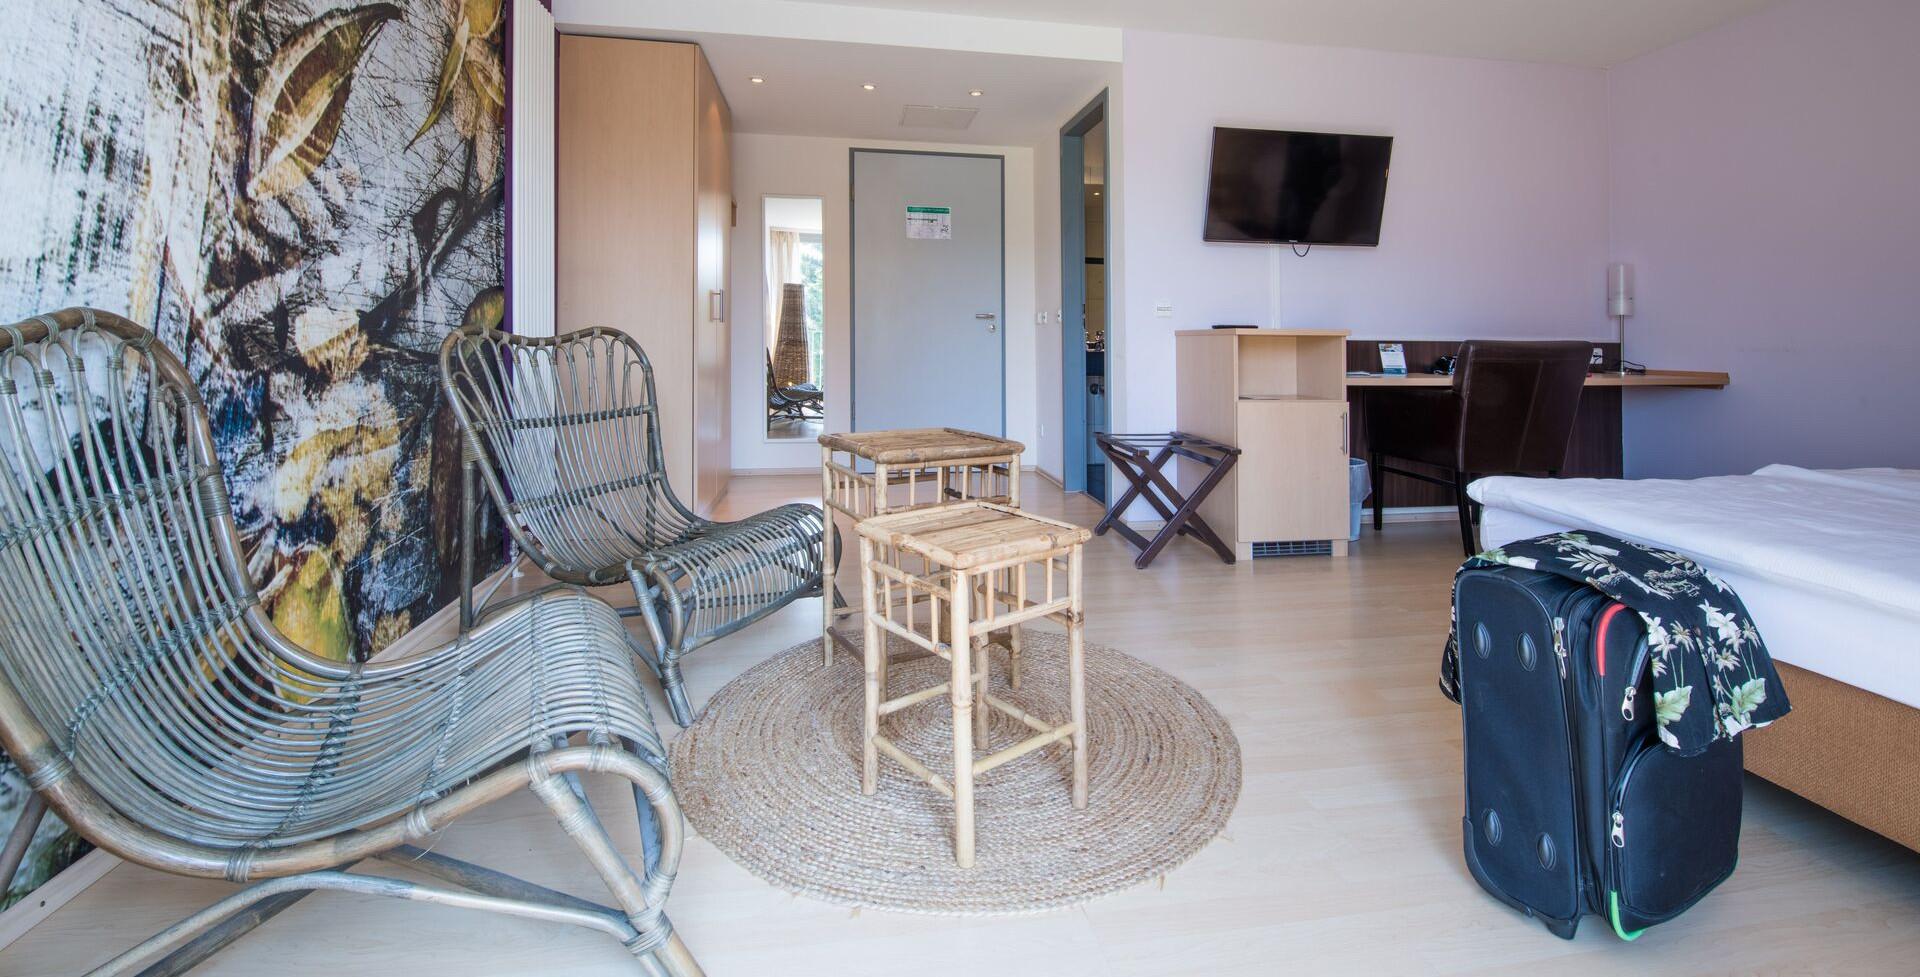 Konstanz-Hotel-KoOno-Zimmer-Bett-07_Copyright_MTK-Chris-Danneffel